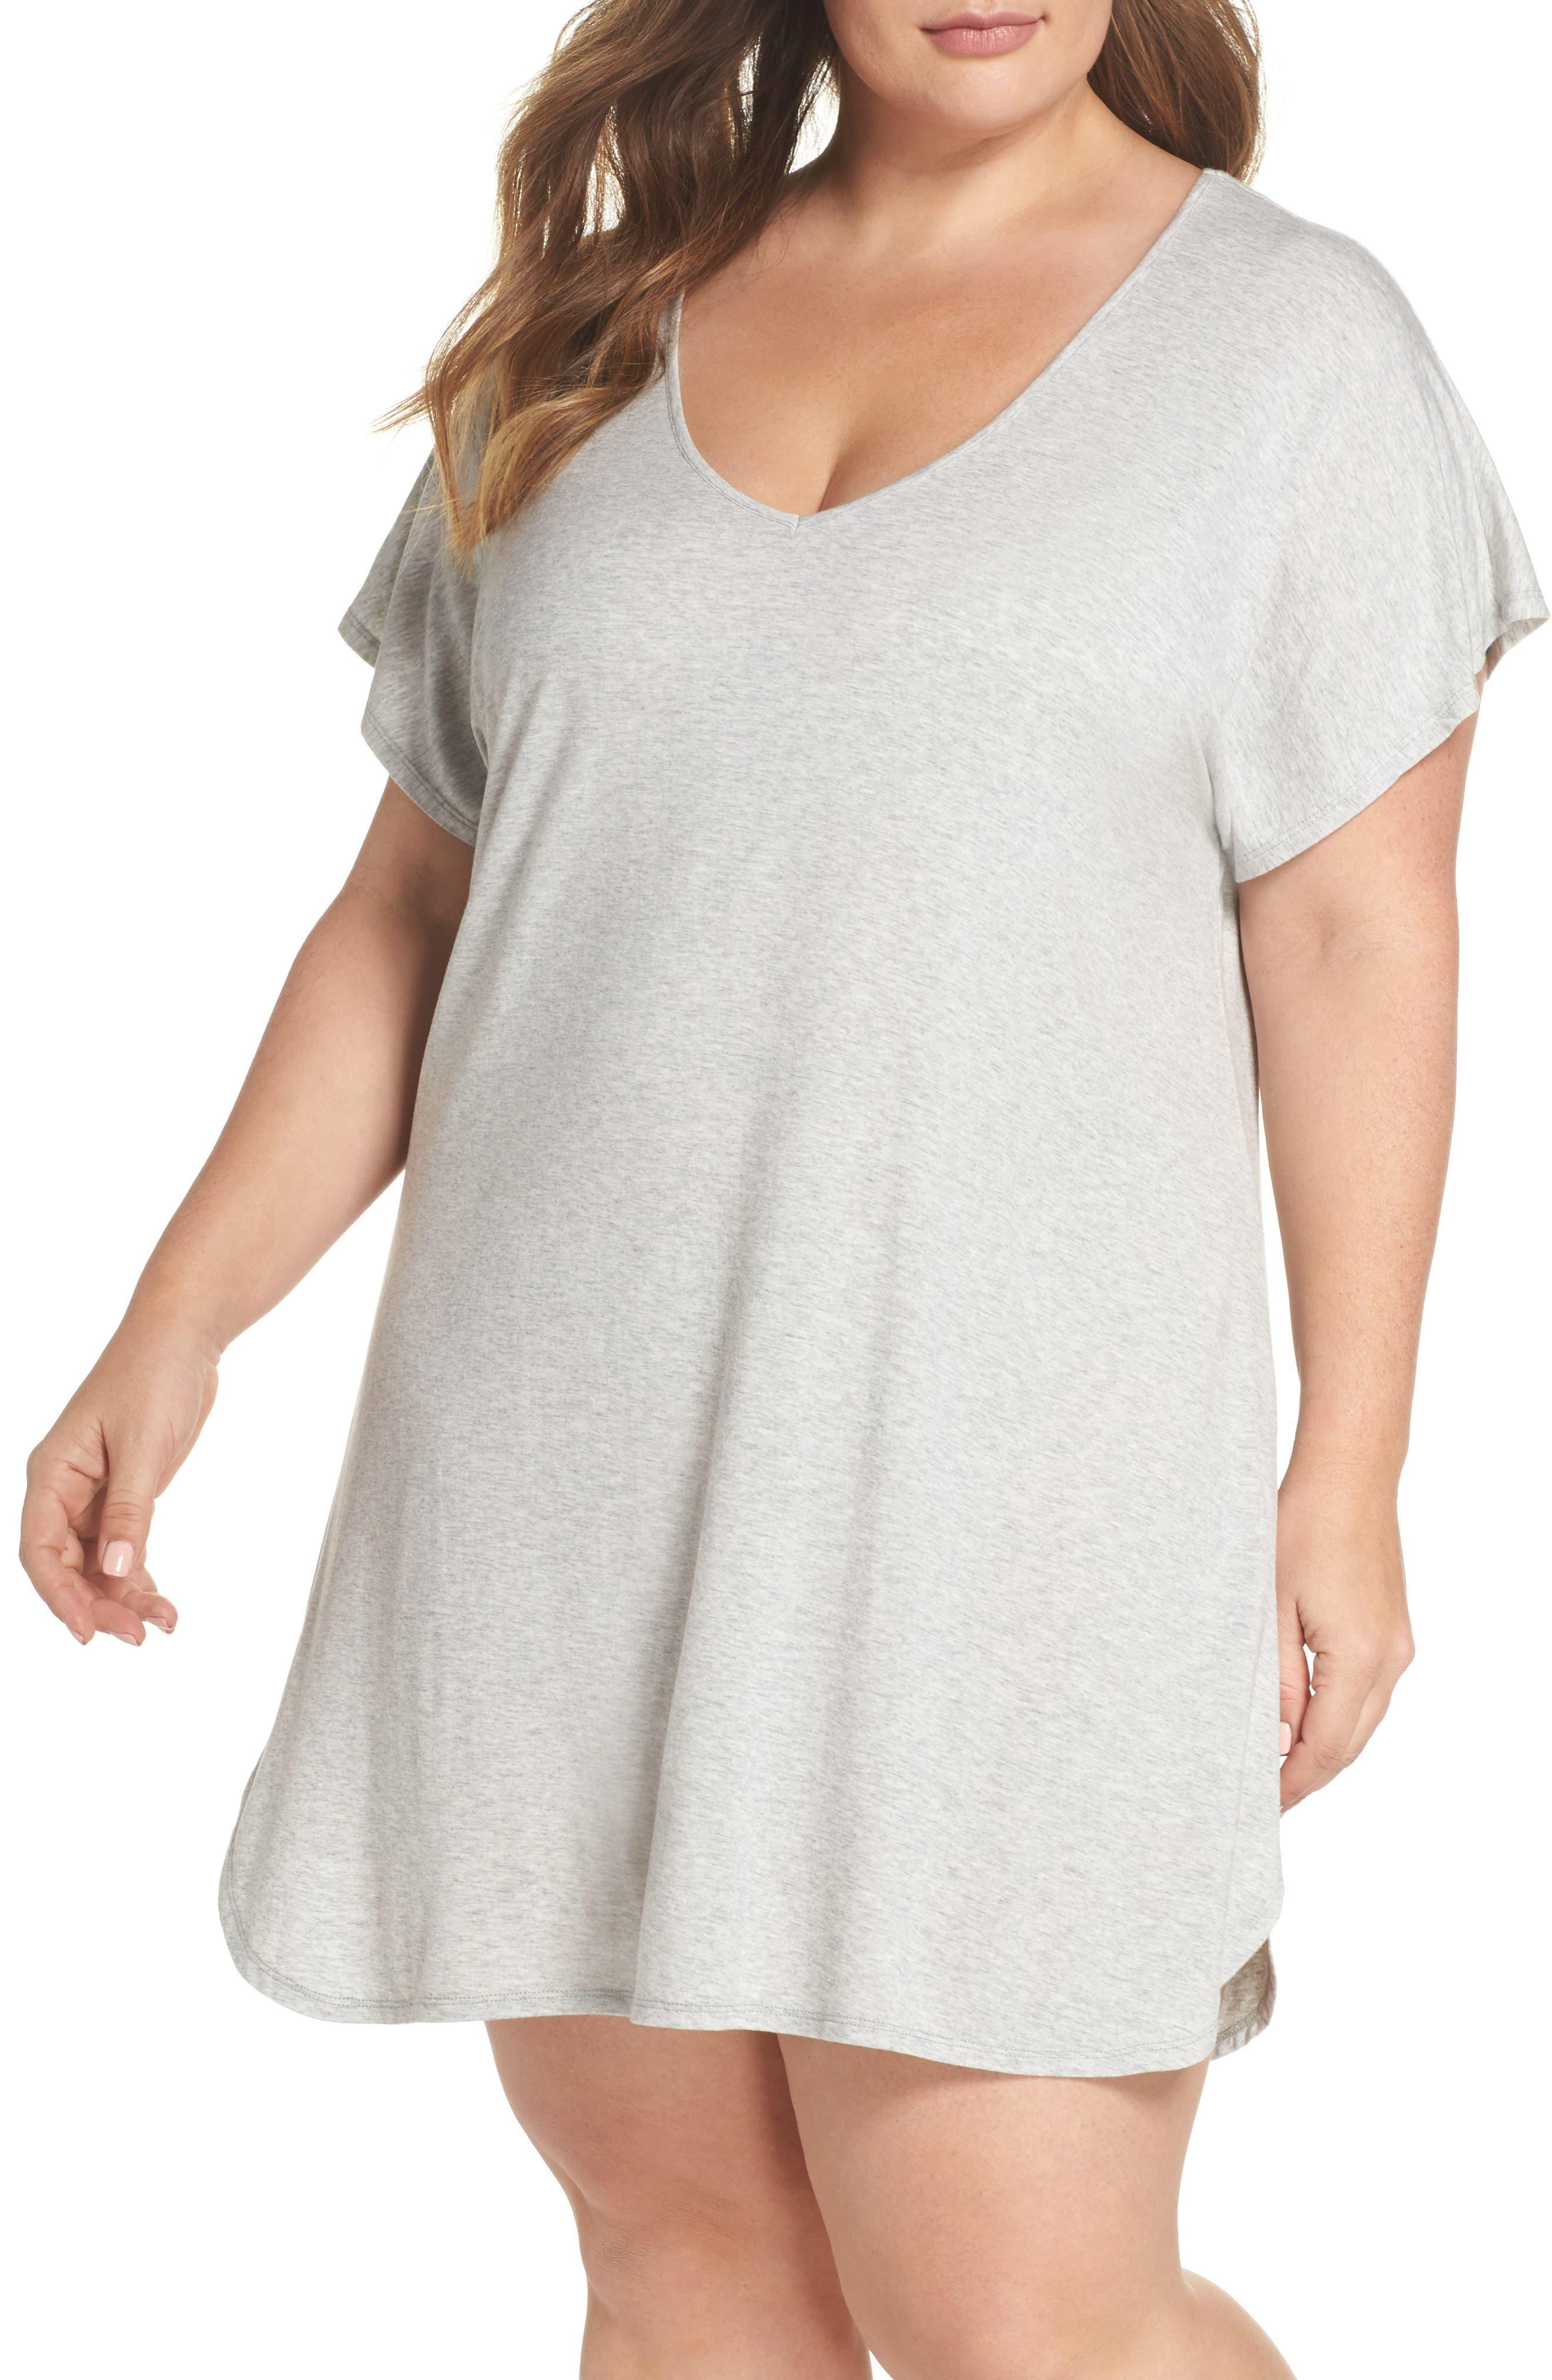 Dolman Sleeve Nightshirt,                         Main,                         color, Grey Pearl Heather